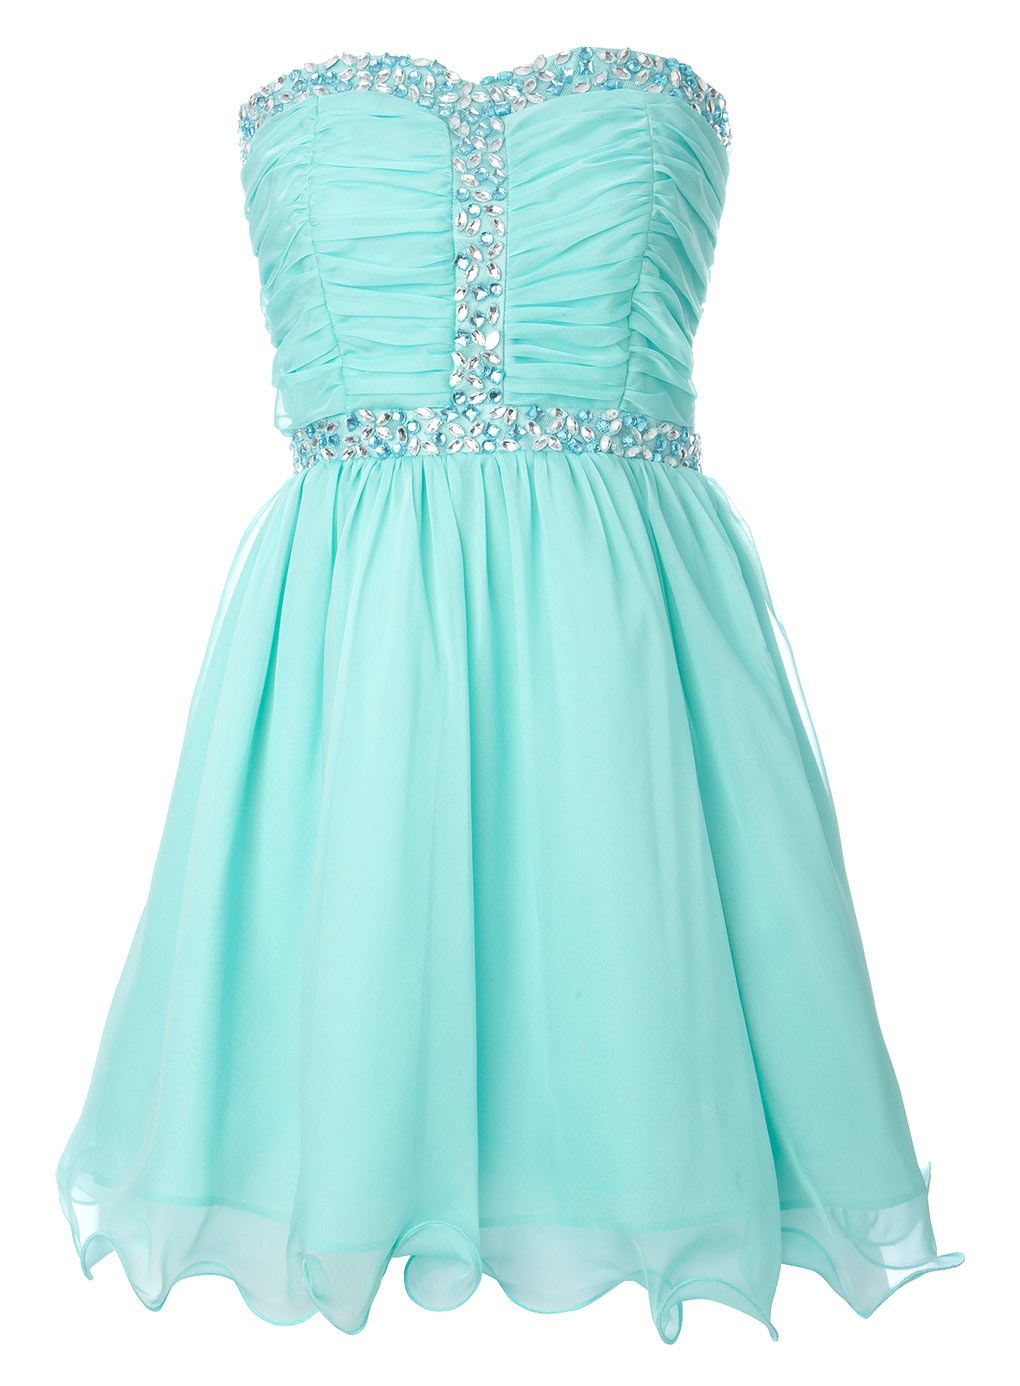 Aqua chiffon gem dress dresses older girls 7 14 children aqua chiffon gem dress dresses older girls 7 14 ombrellifo Choice Image